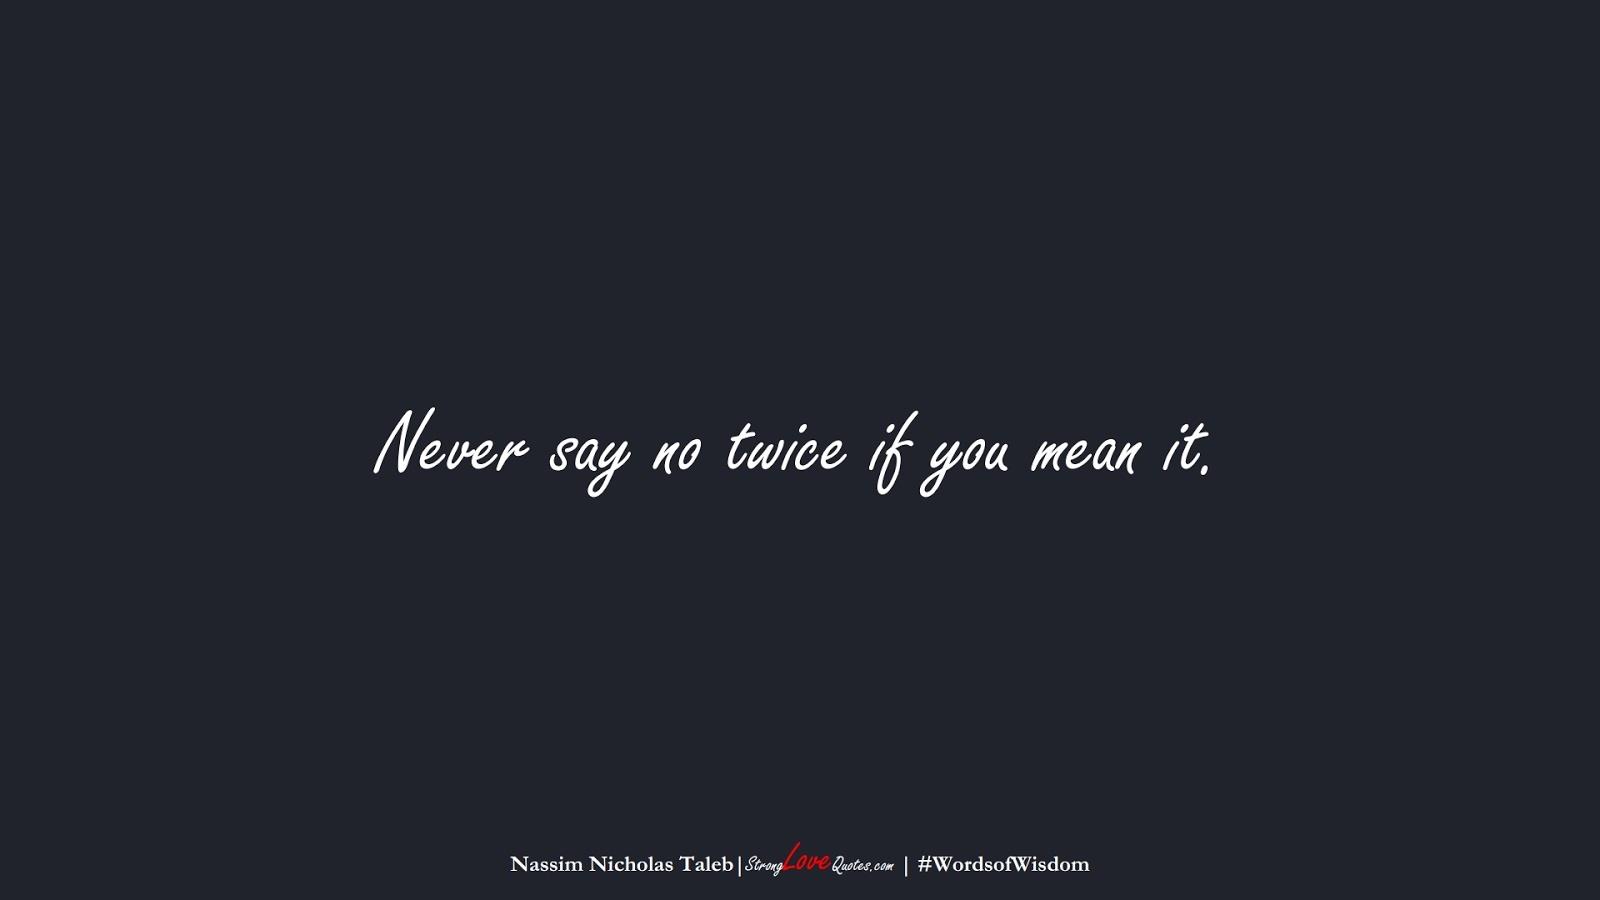 Never say no twice if you mean it. (Nassim Nicholas Taleb);  #WordsofWisdom